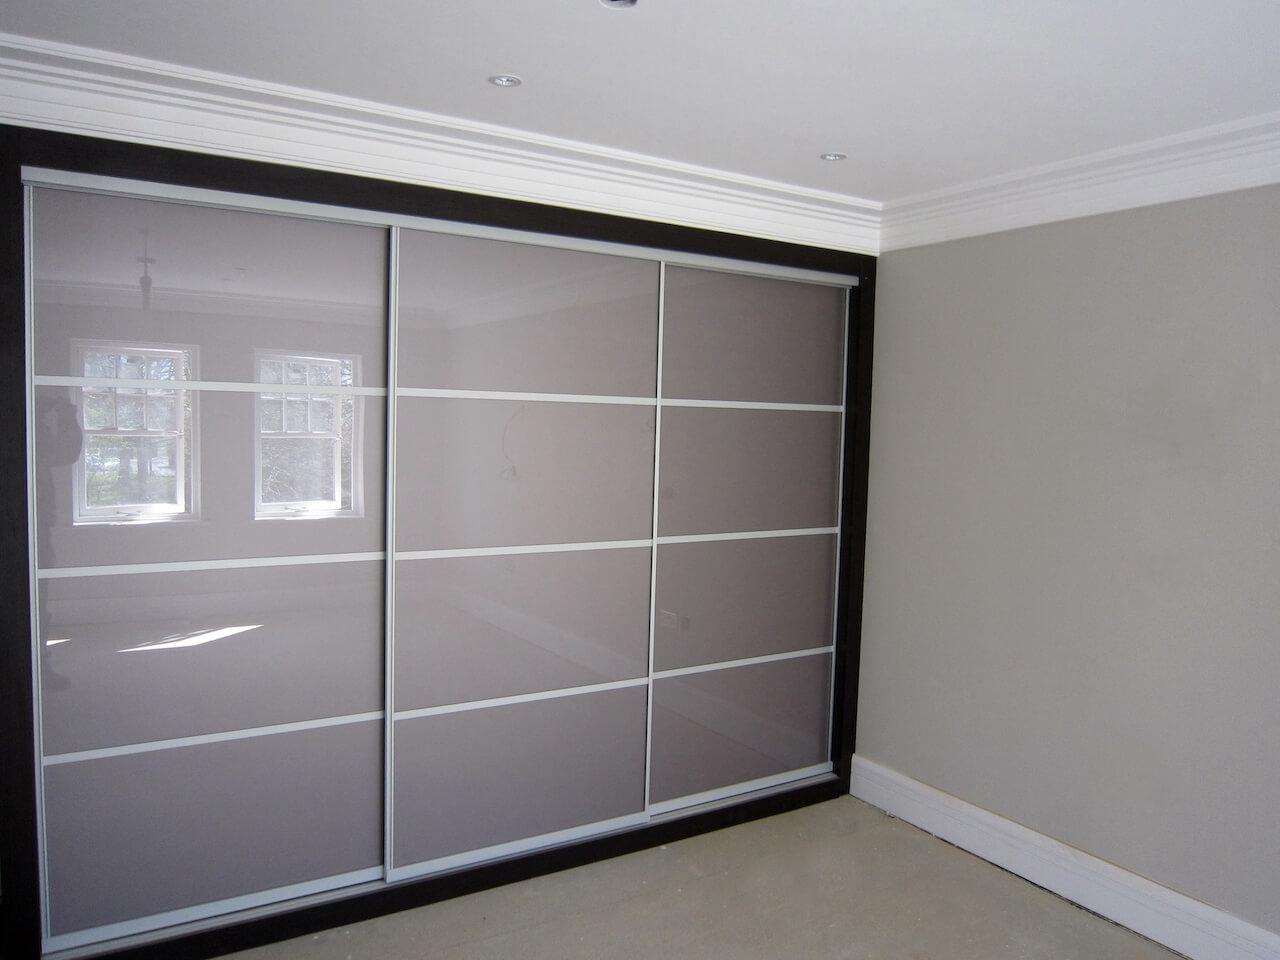 Sliding-Doors-with-constrasting-frame-Bexley-Kent.JPG